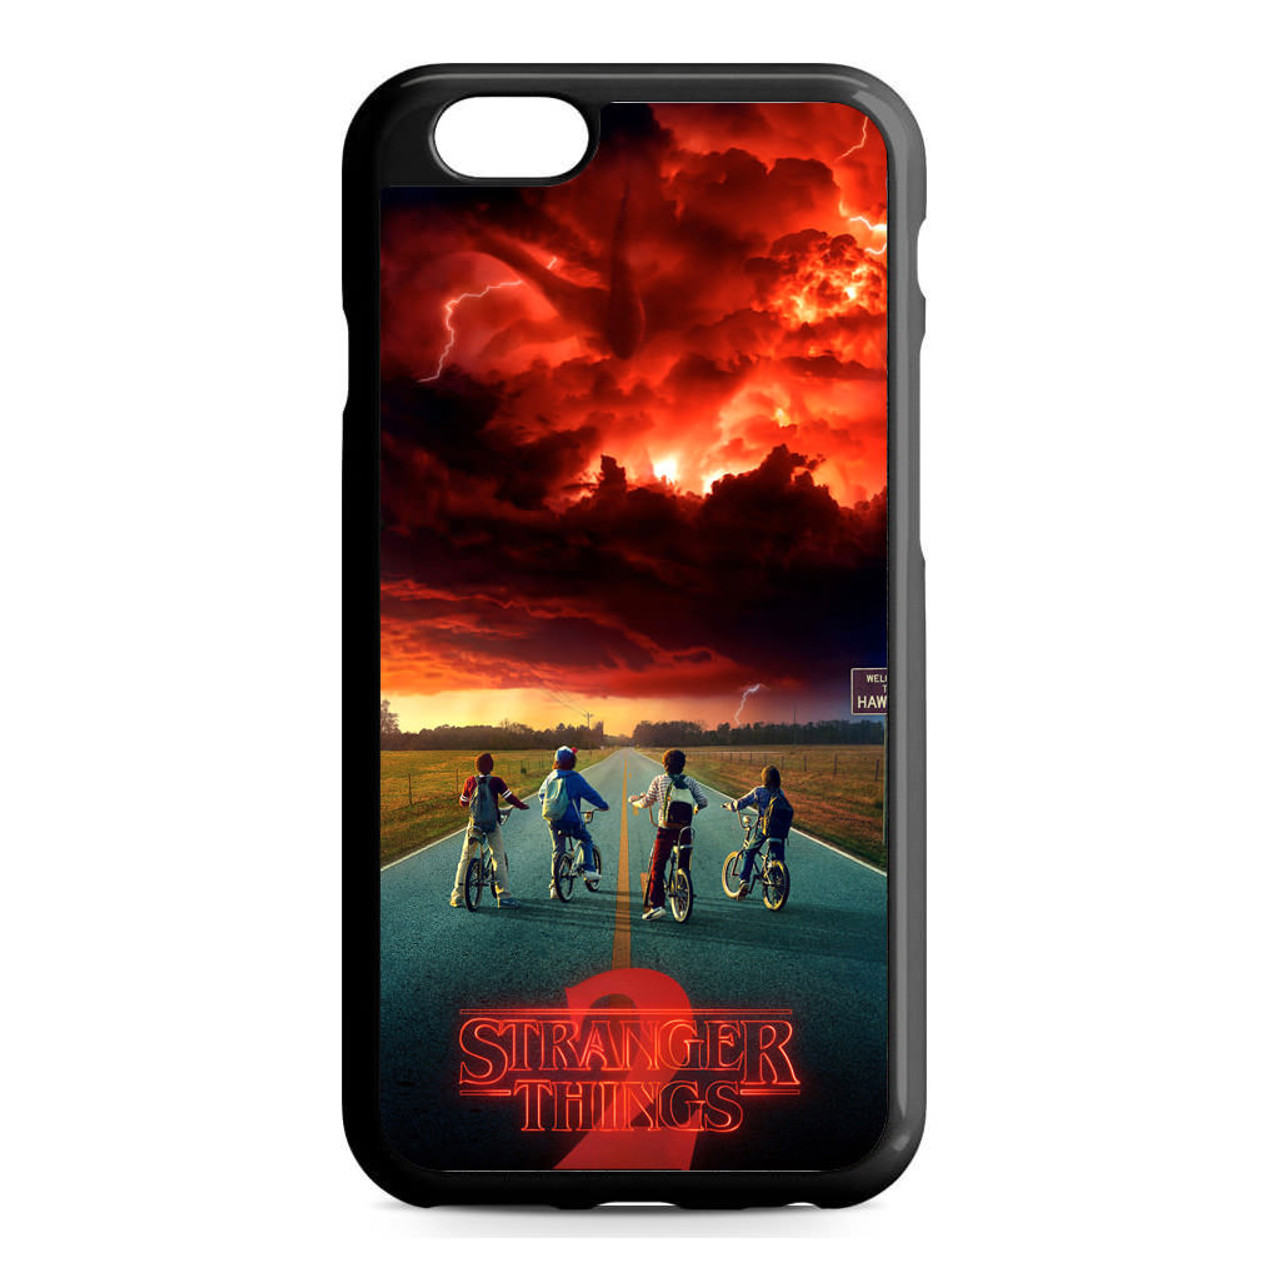 new concept 48355 ec3f6 Stranger Things Season 2 iPhone 6/6S Case